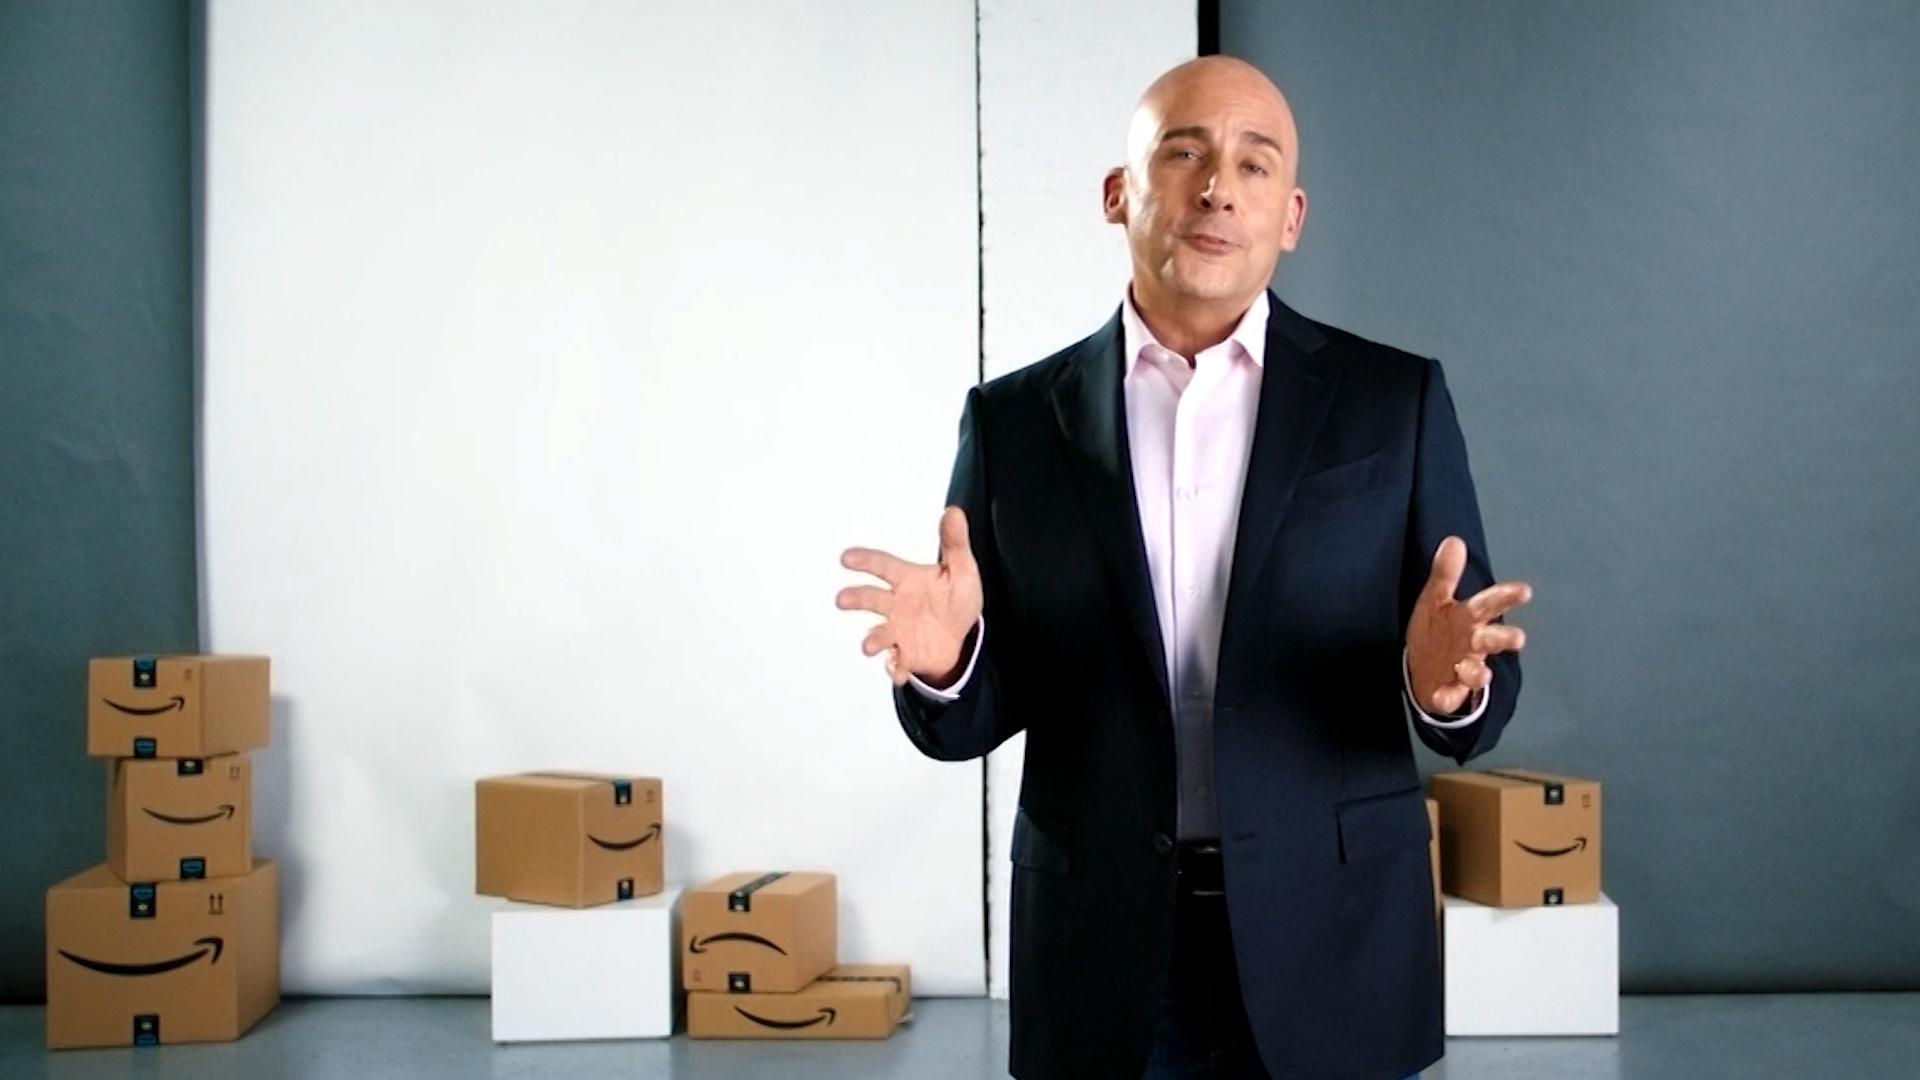 Steve Carell As Jeff Bezos Mocks Trump On Snl Cnn Video